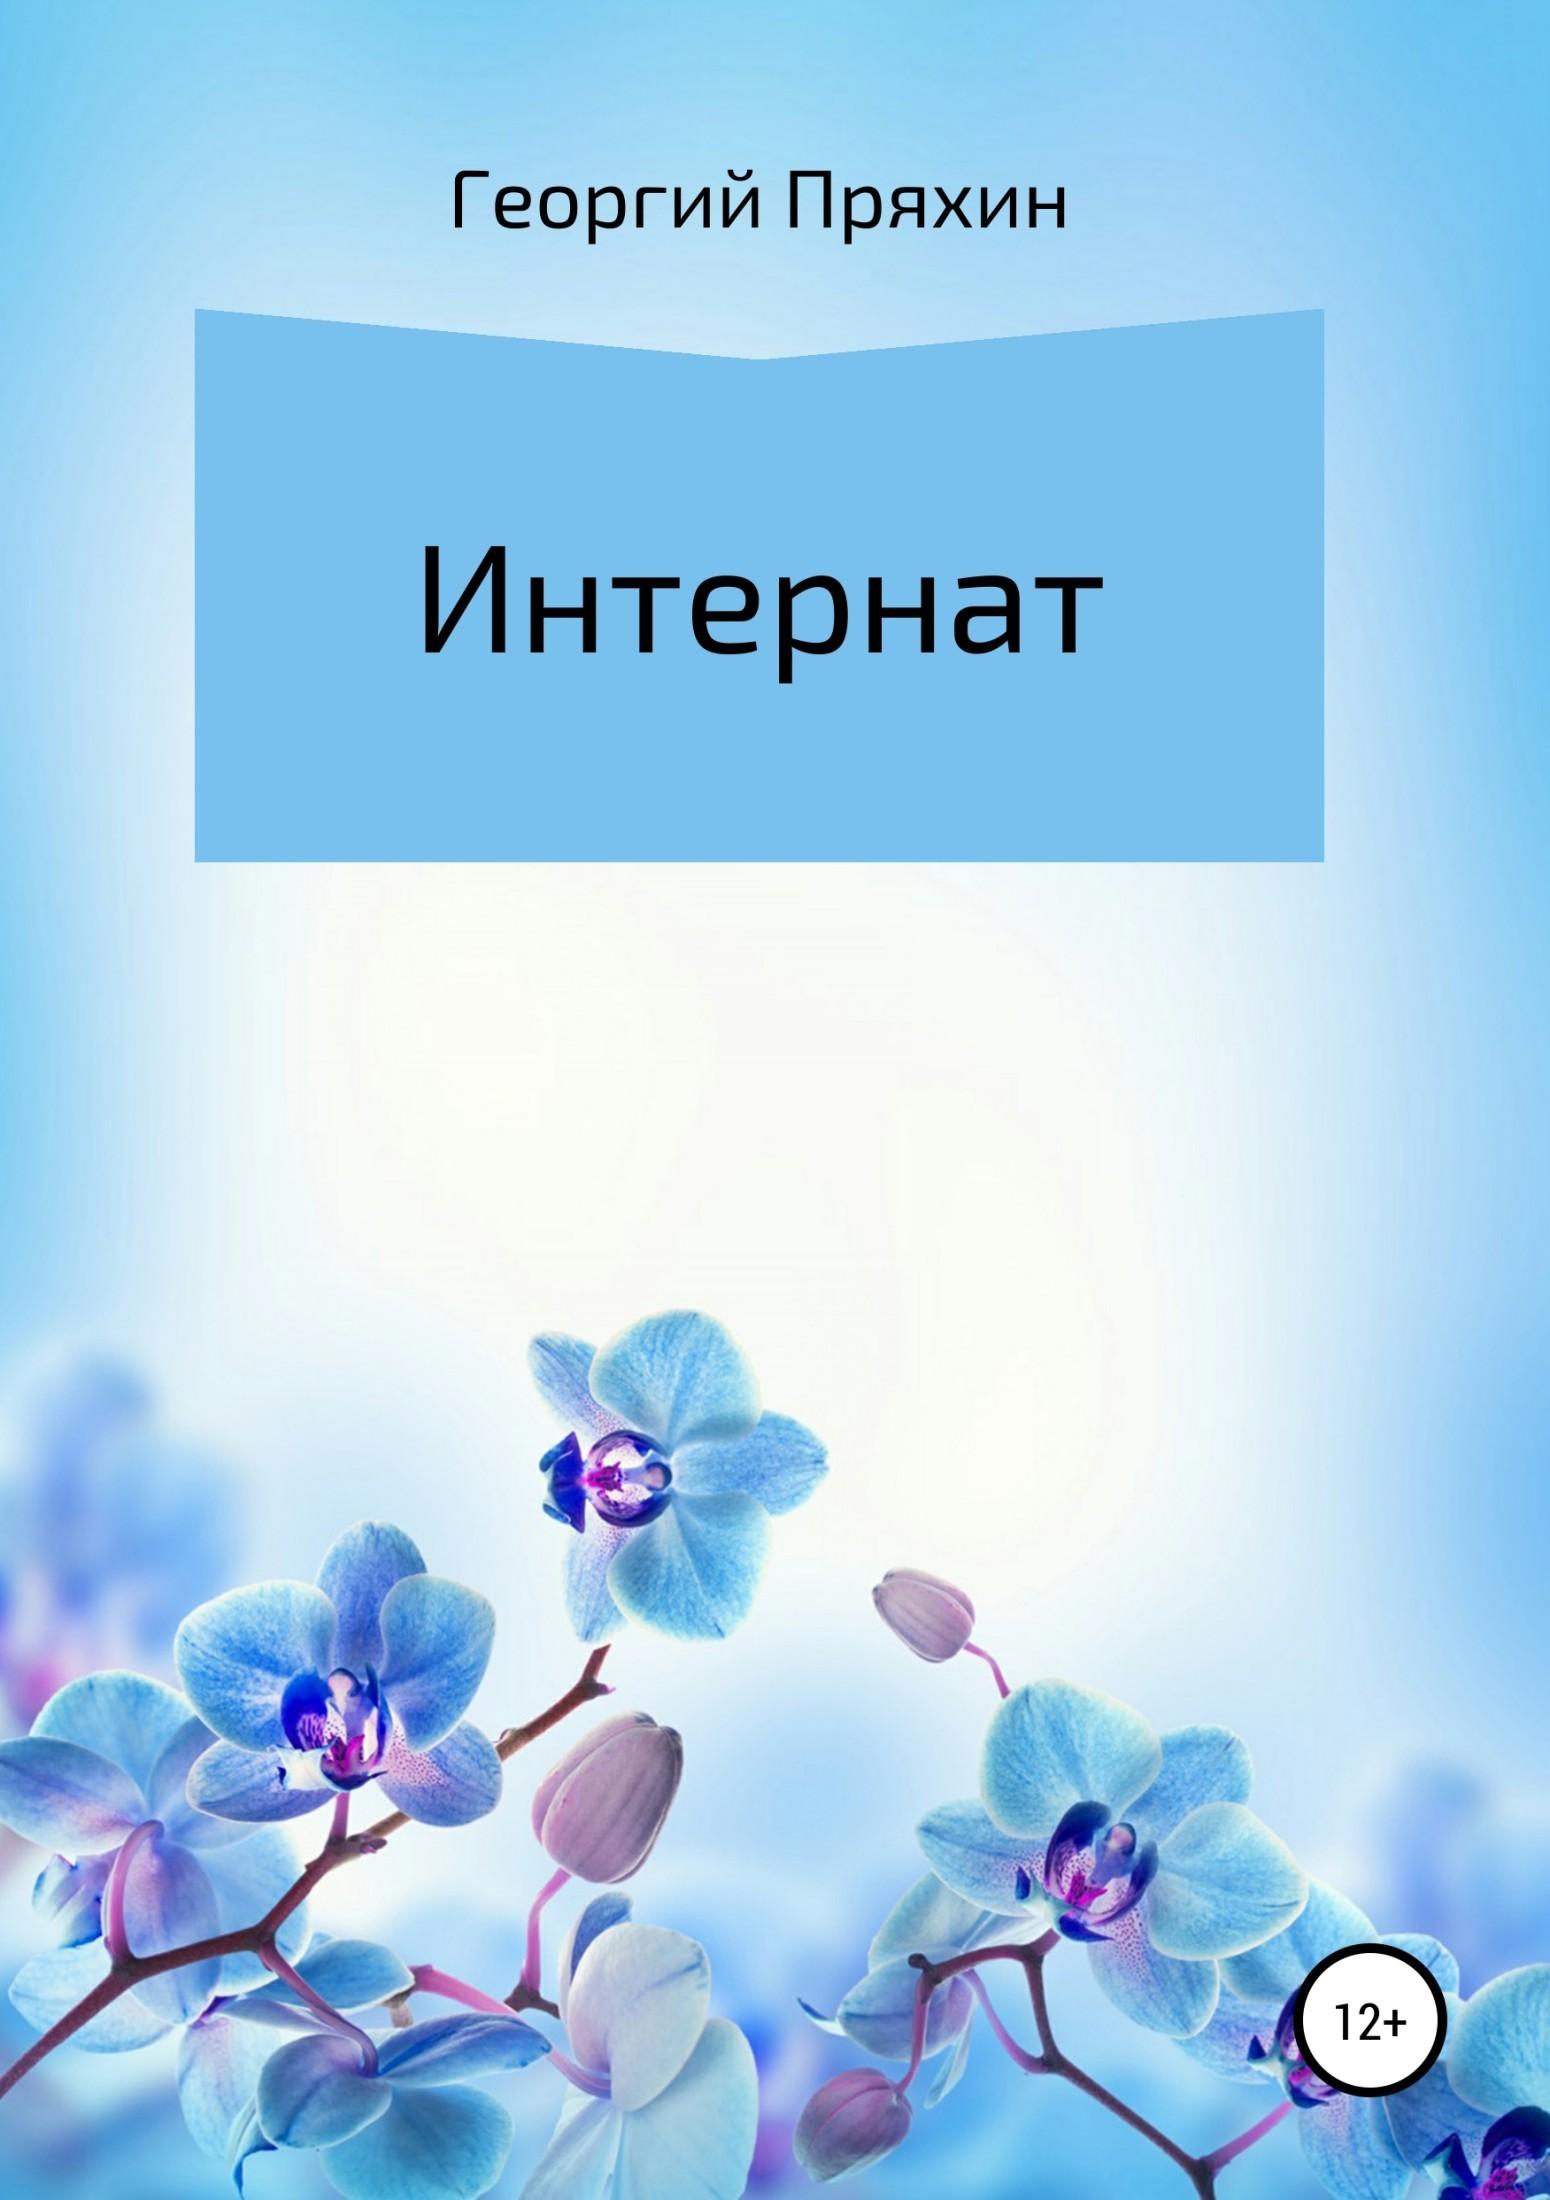 Интернат